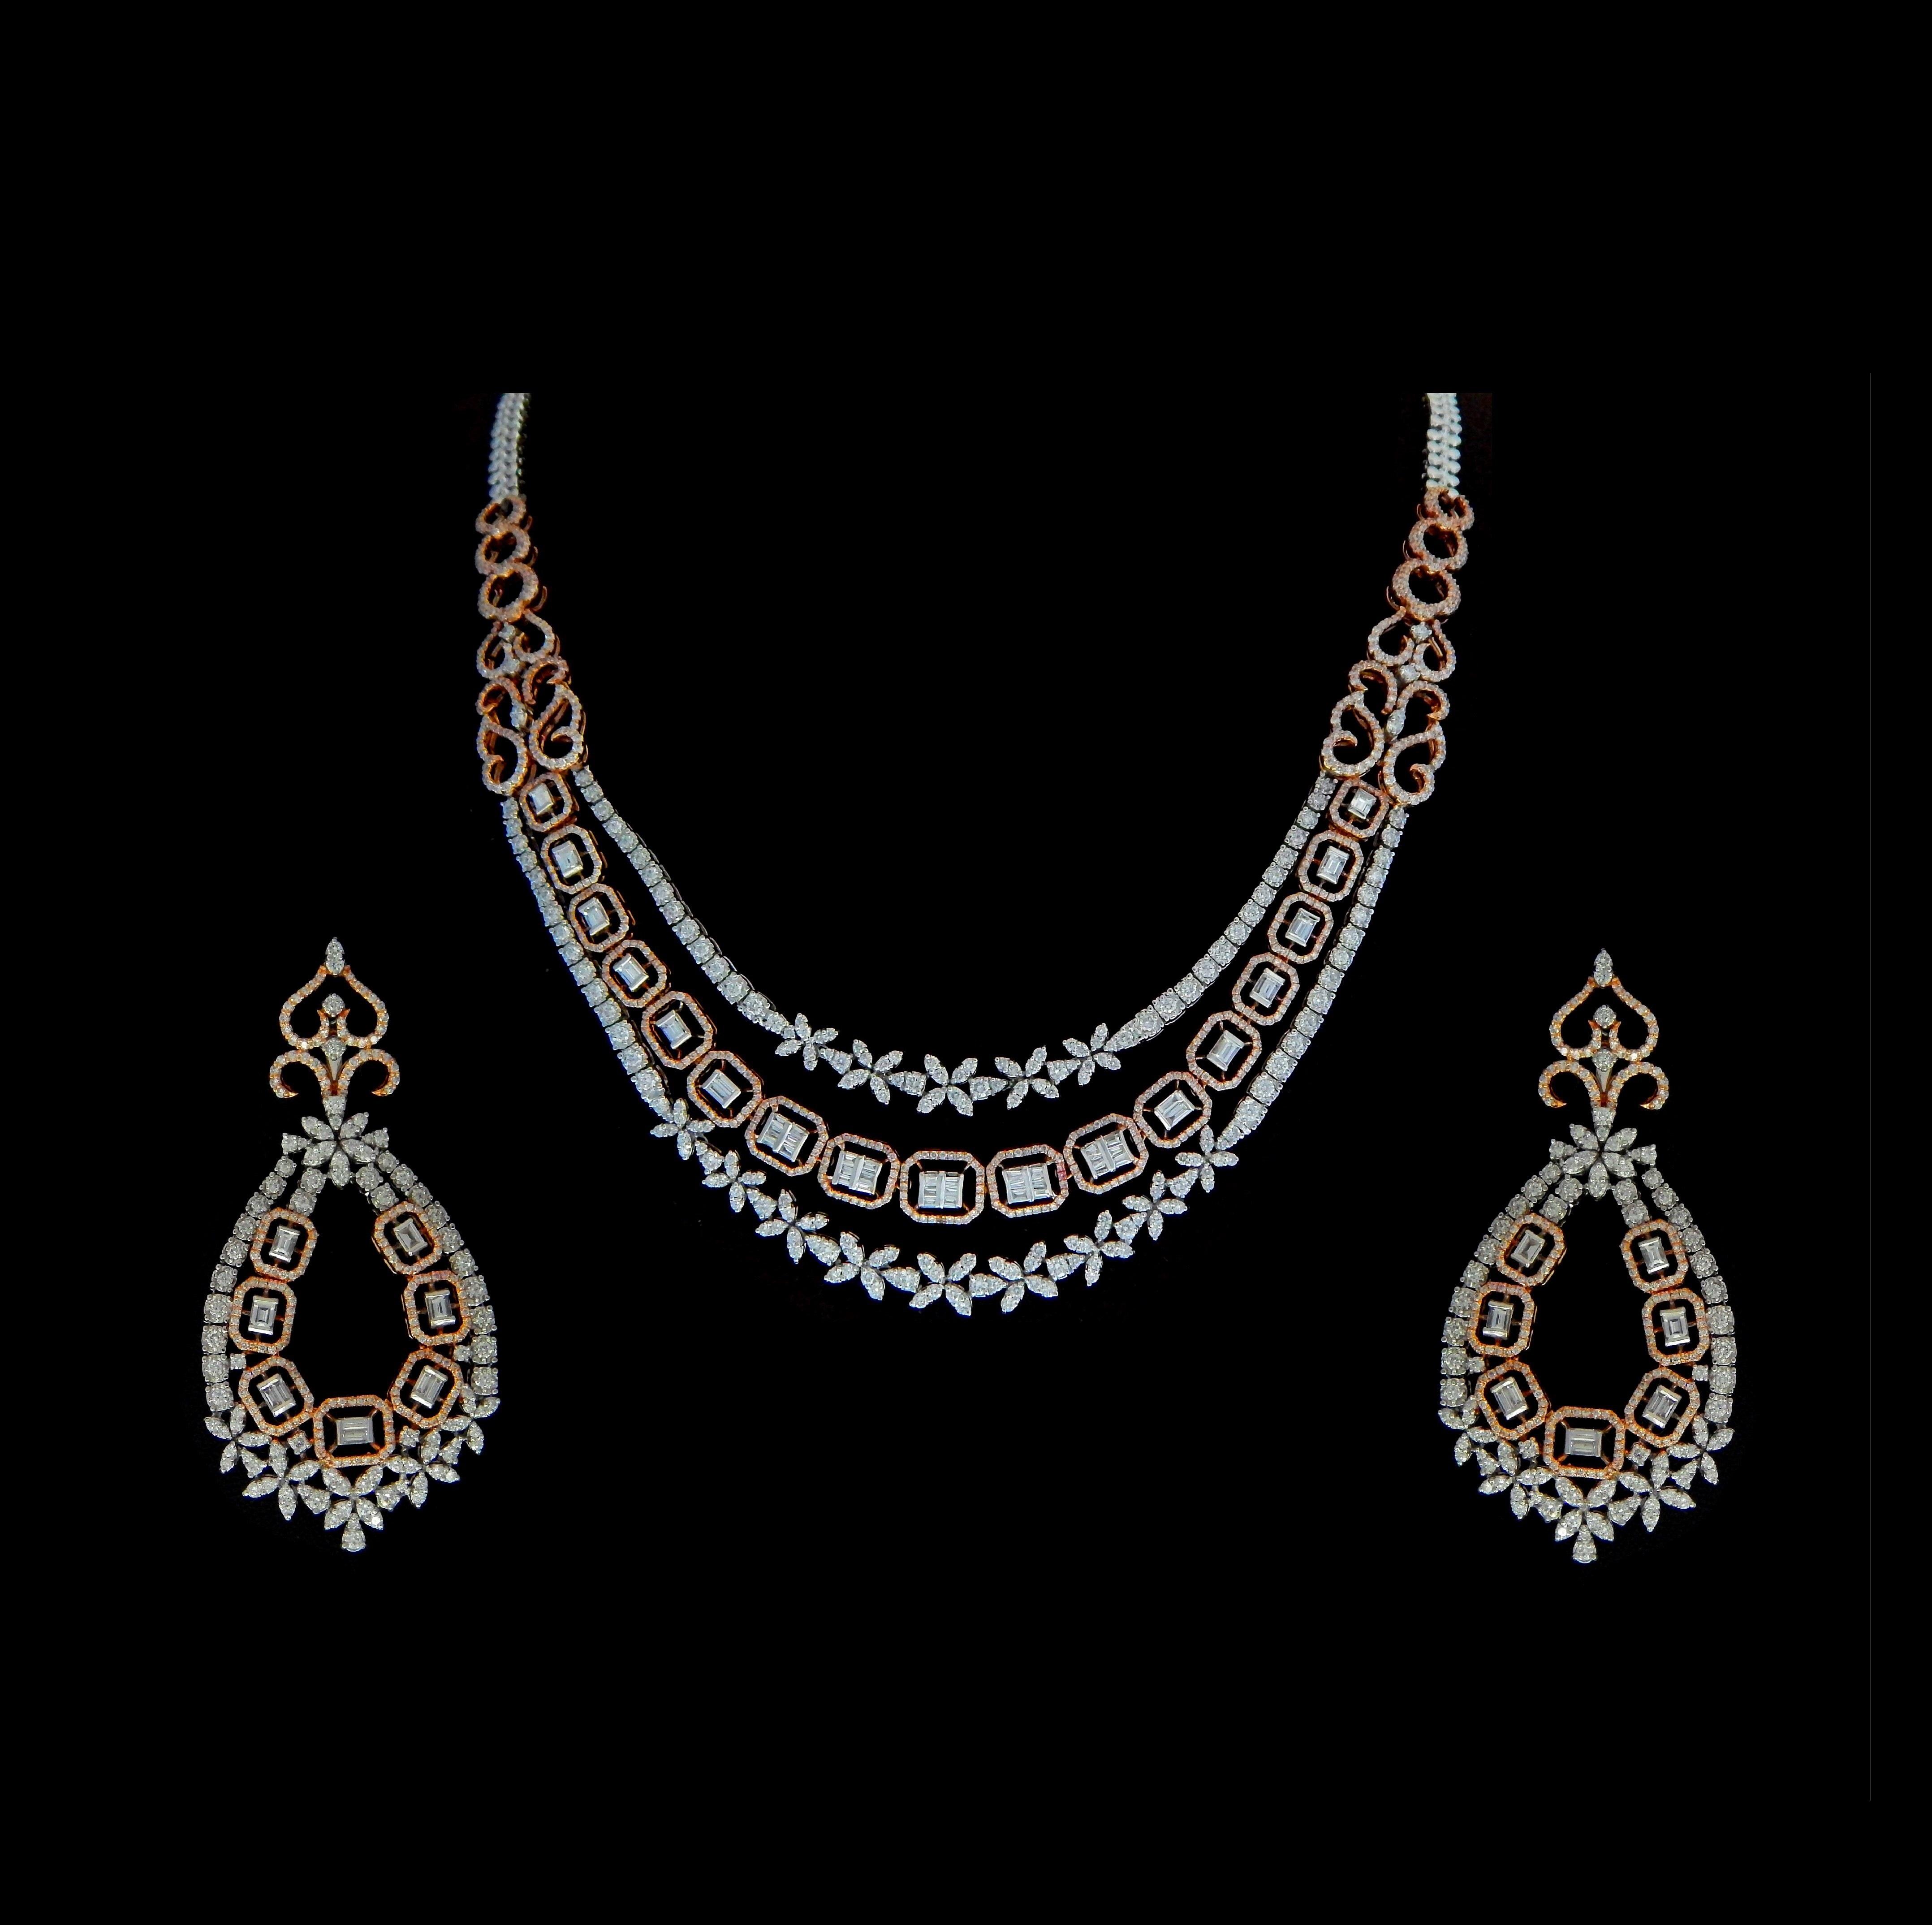 a5504c19e Diamond Necklace / Chokers - Designer Diamond Haram with Detachable ...